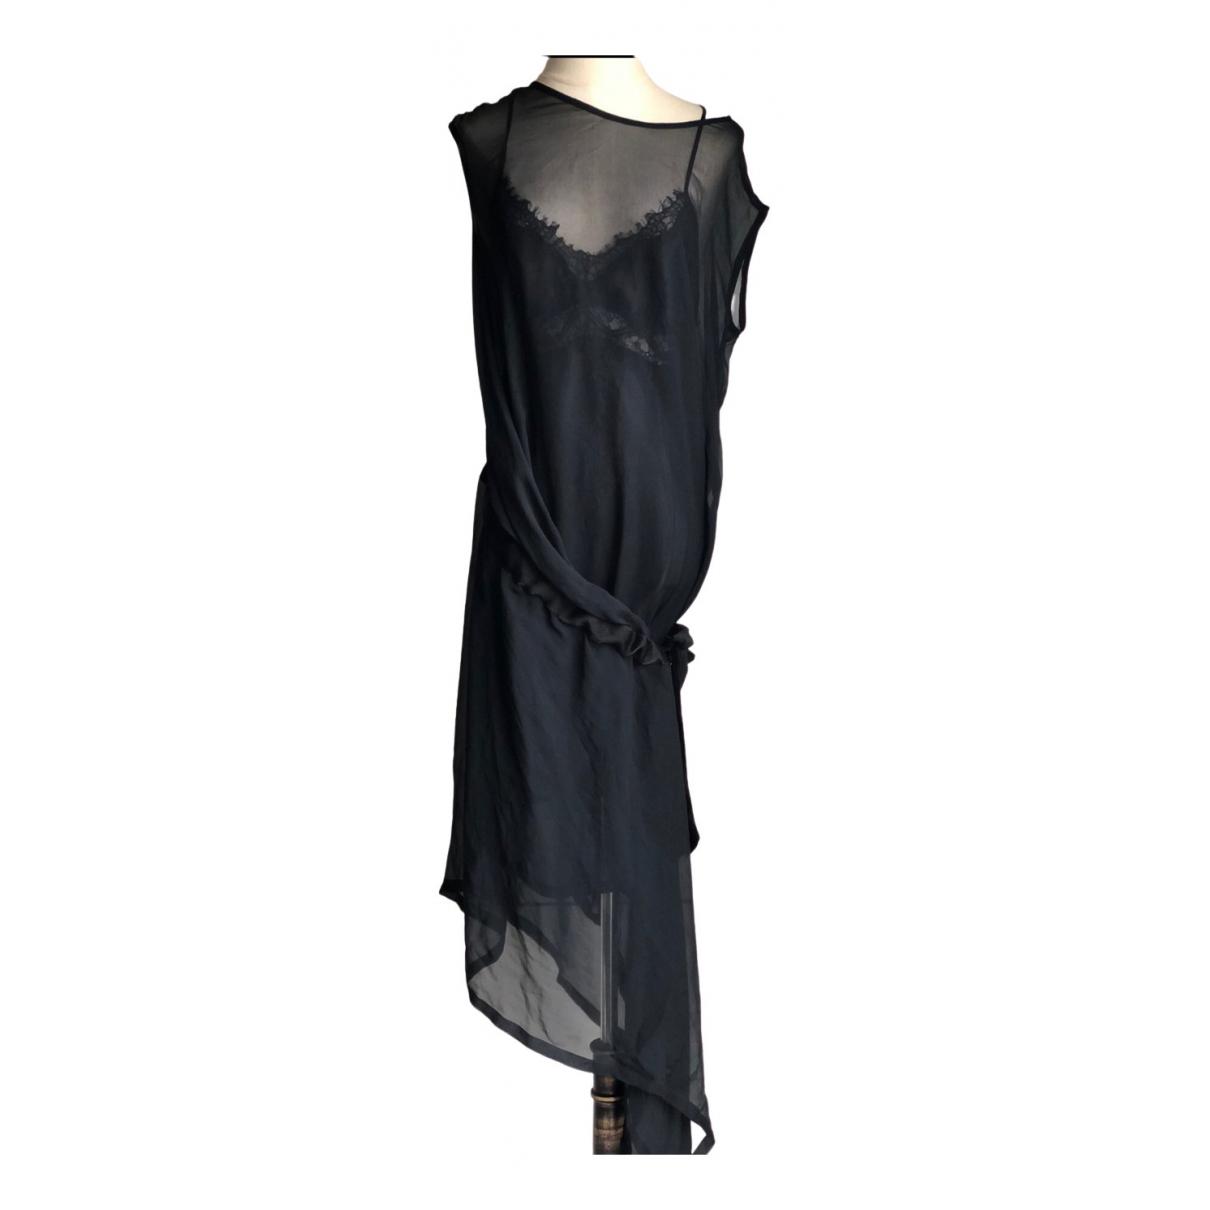 Ann Demeulemeester - Robe   pour femme en soie - noir